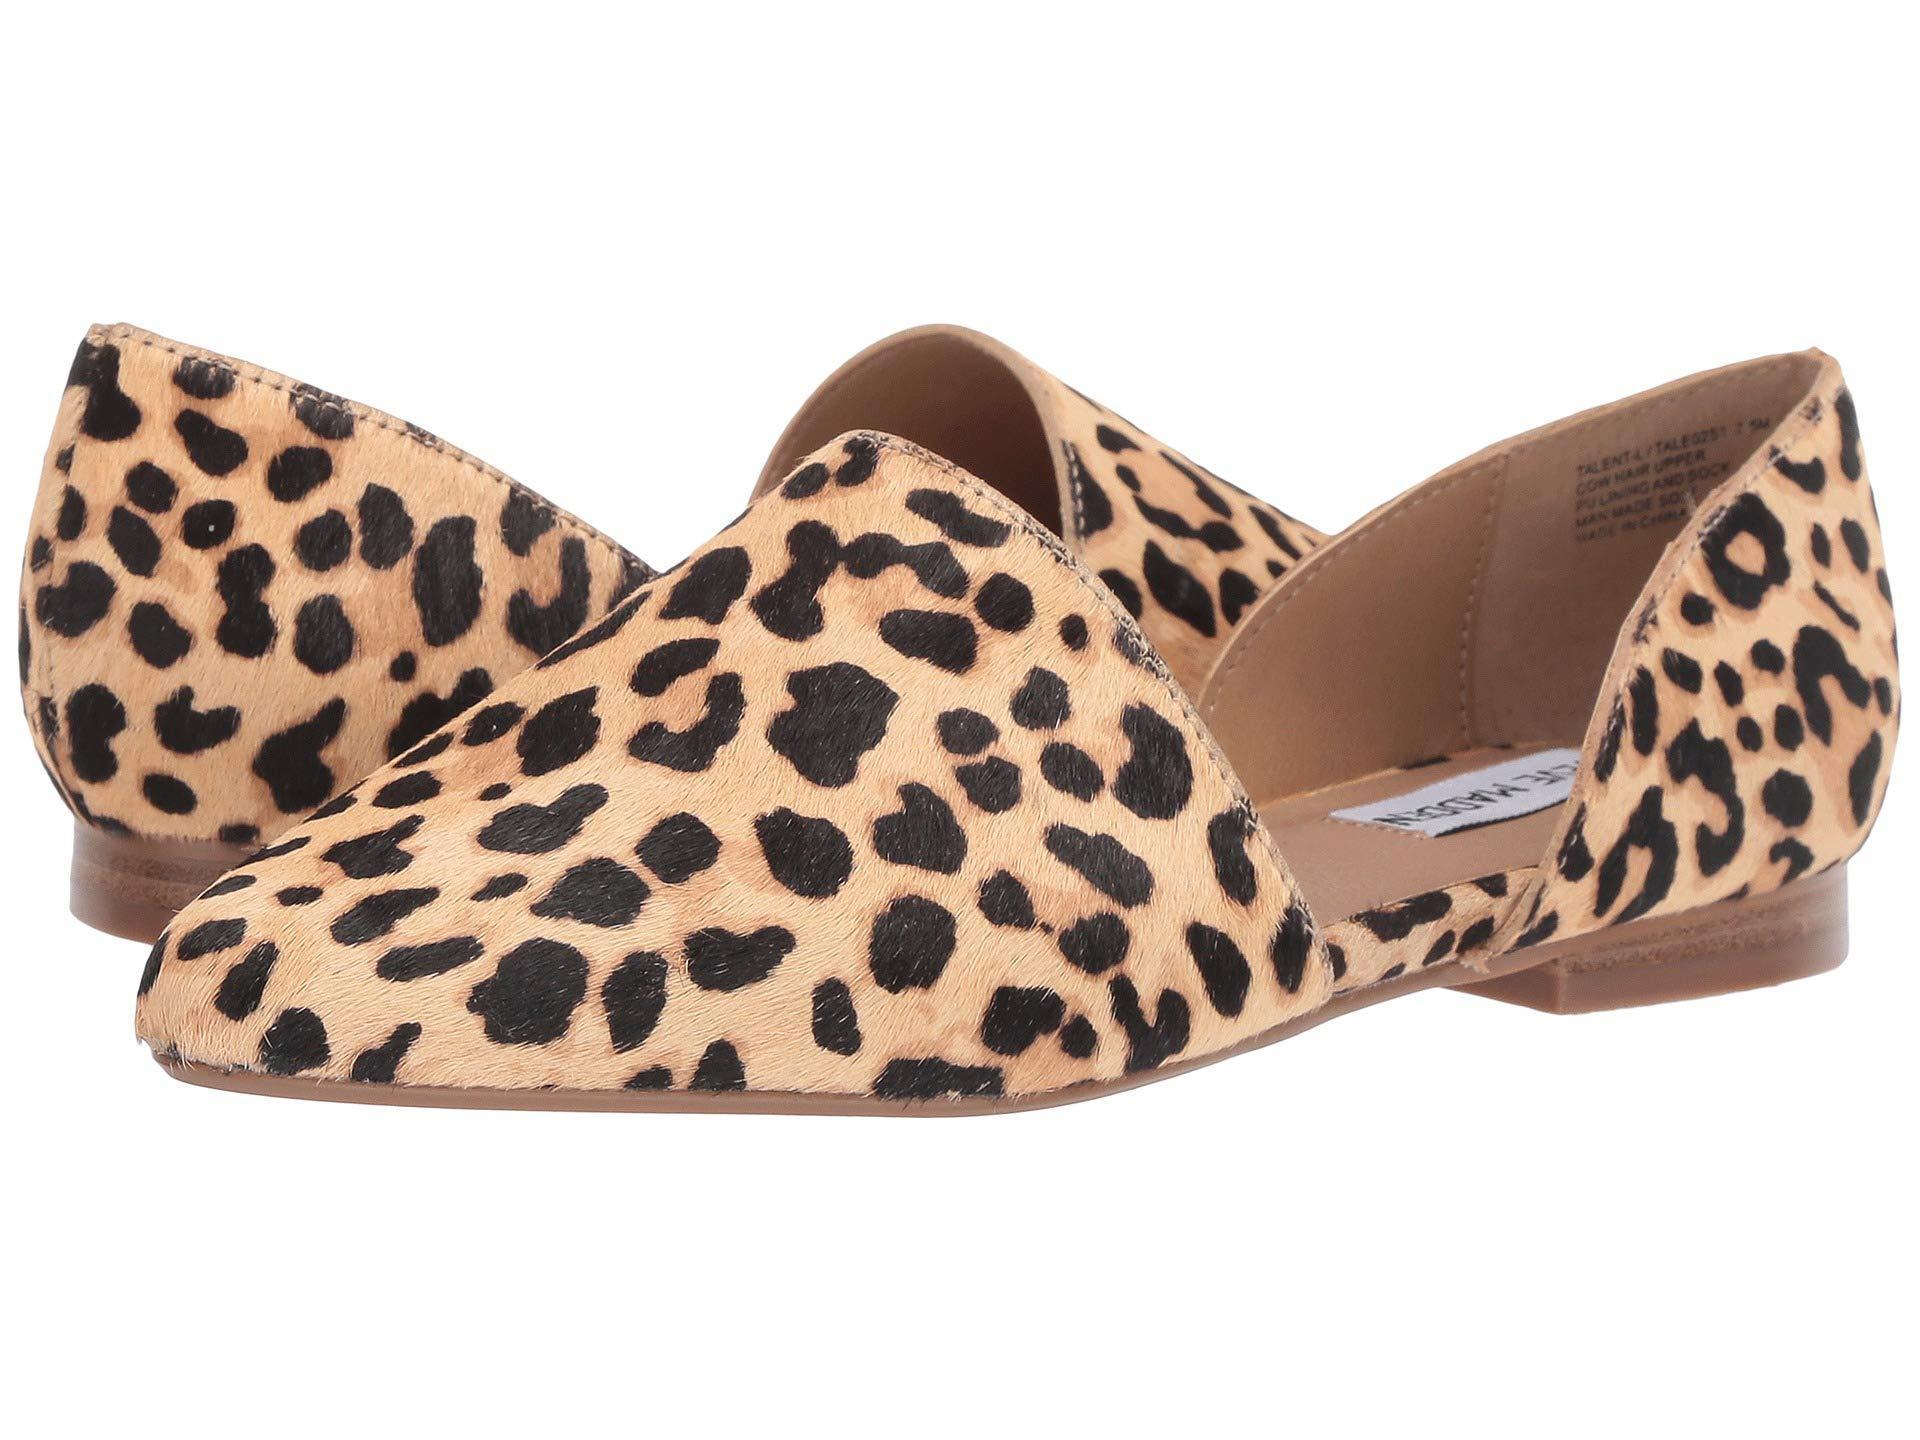 9ae810215cd Lyst - Steve Madden Talent-l Flat (leopard) Women s Shoes